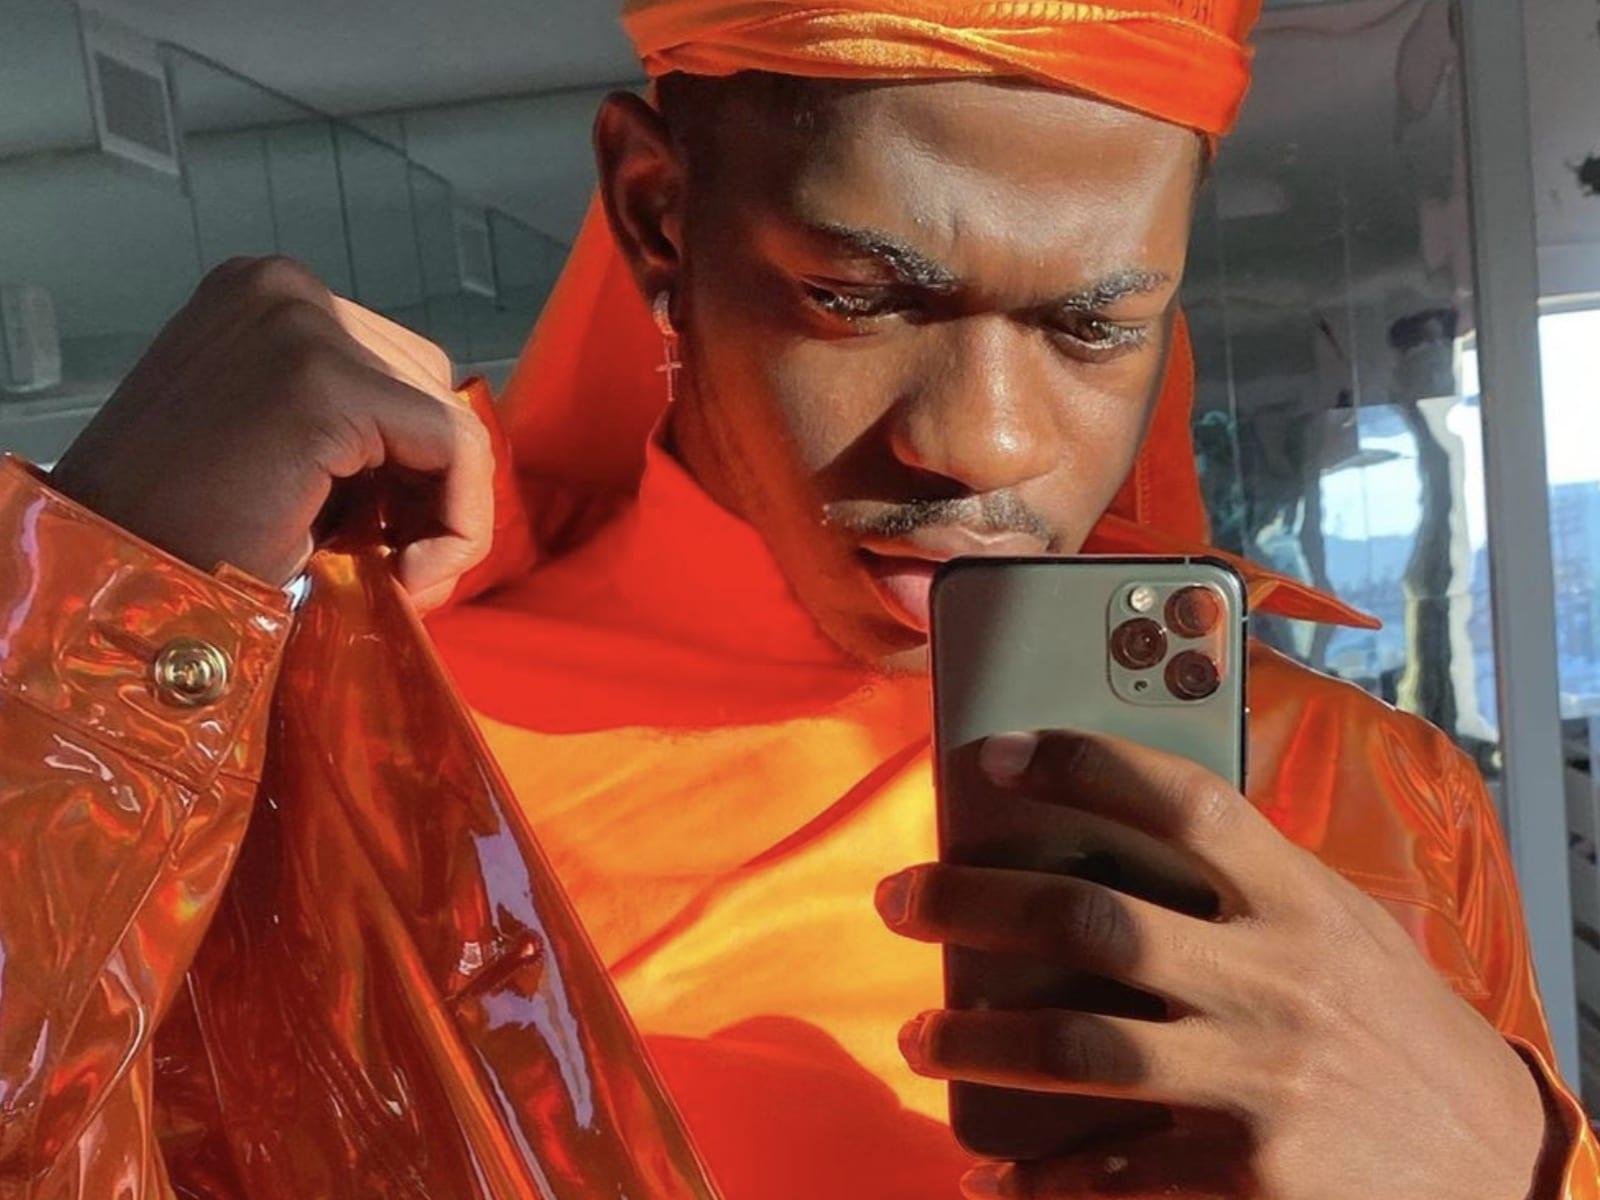 Lil Nas X Selfie 11-22-19